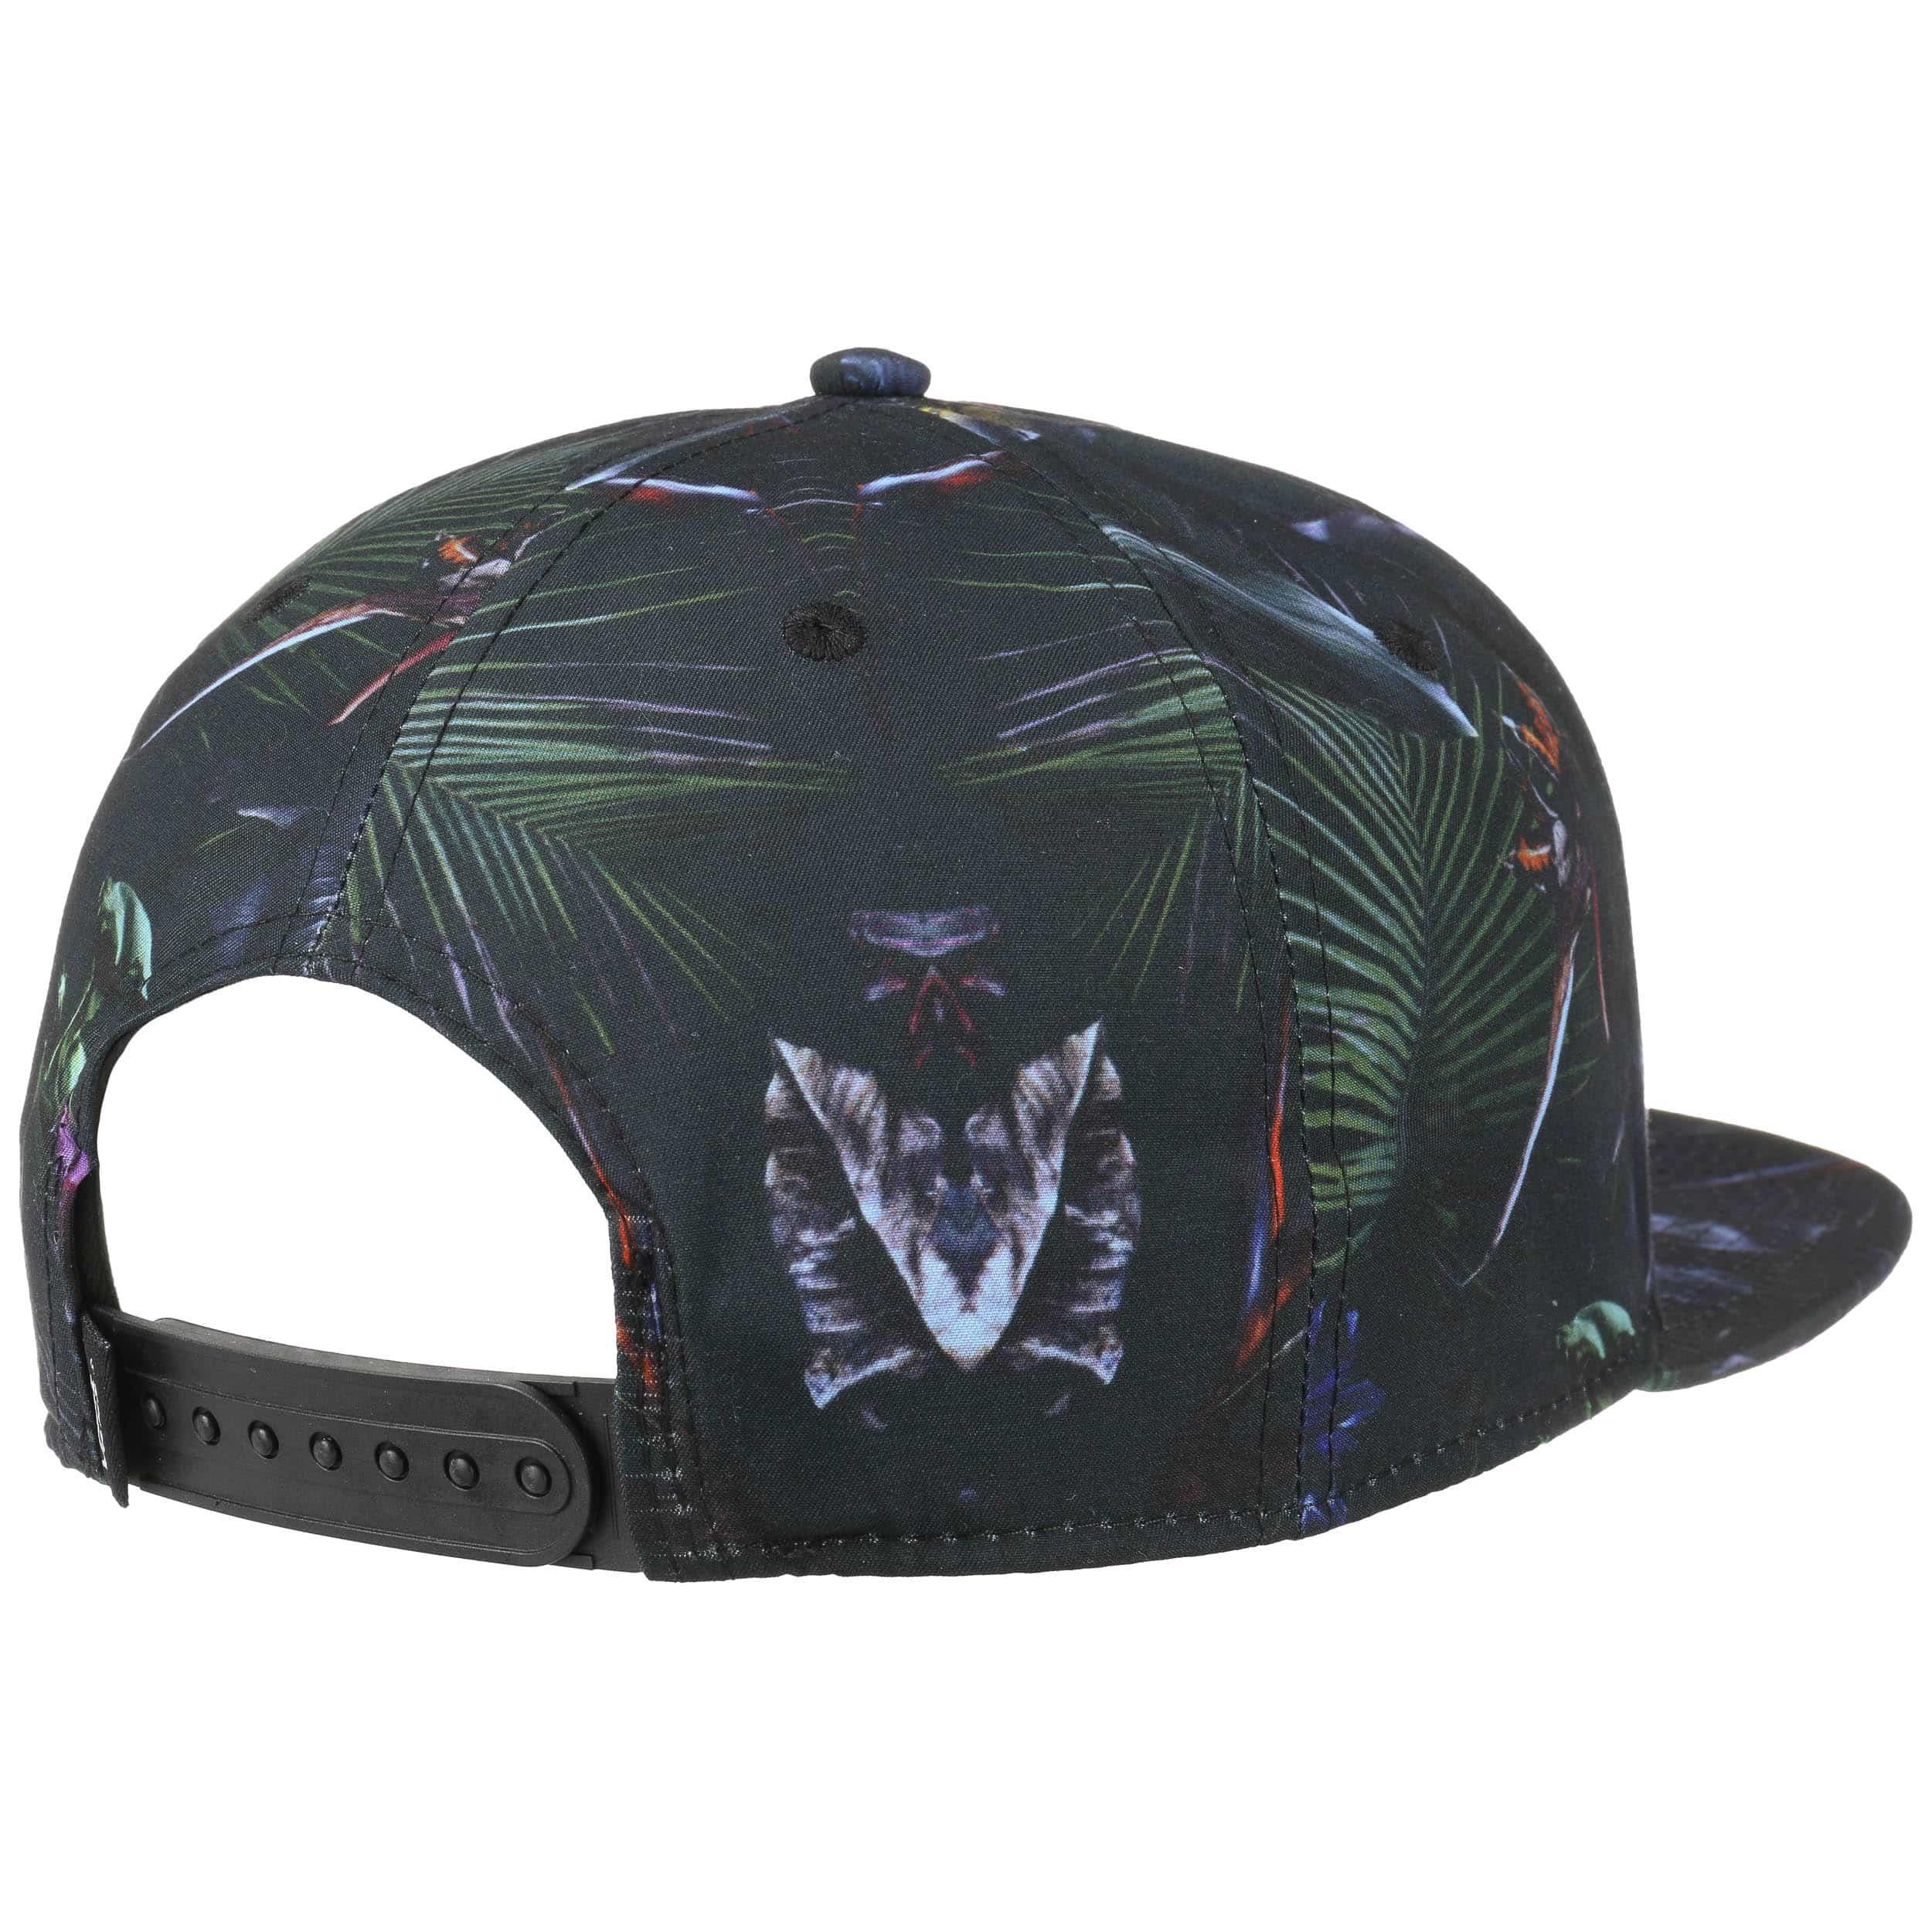 612d749cfba37 ... Allover Jungle Snapback Cap by Vans - schwarz 3 ...